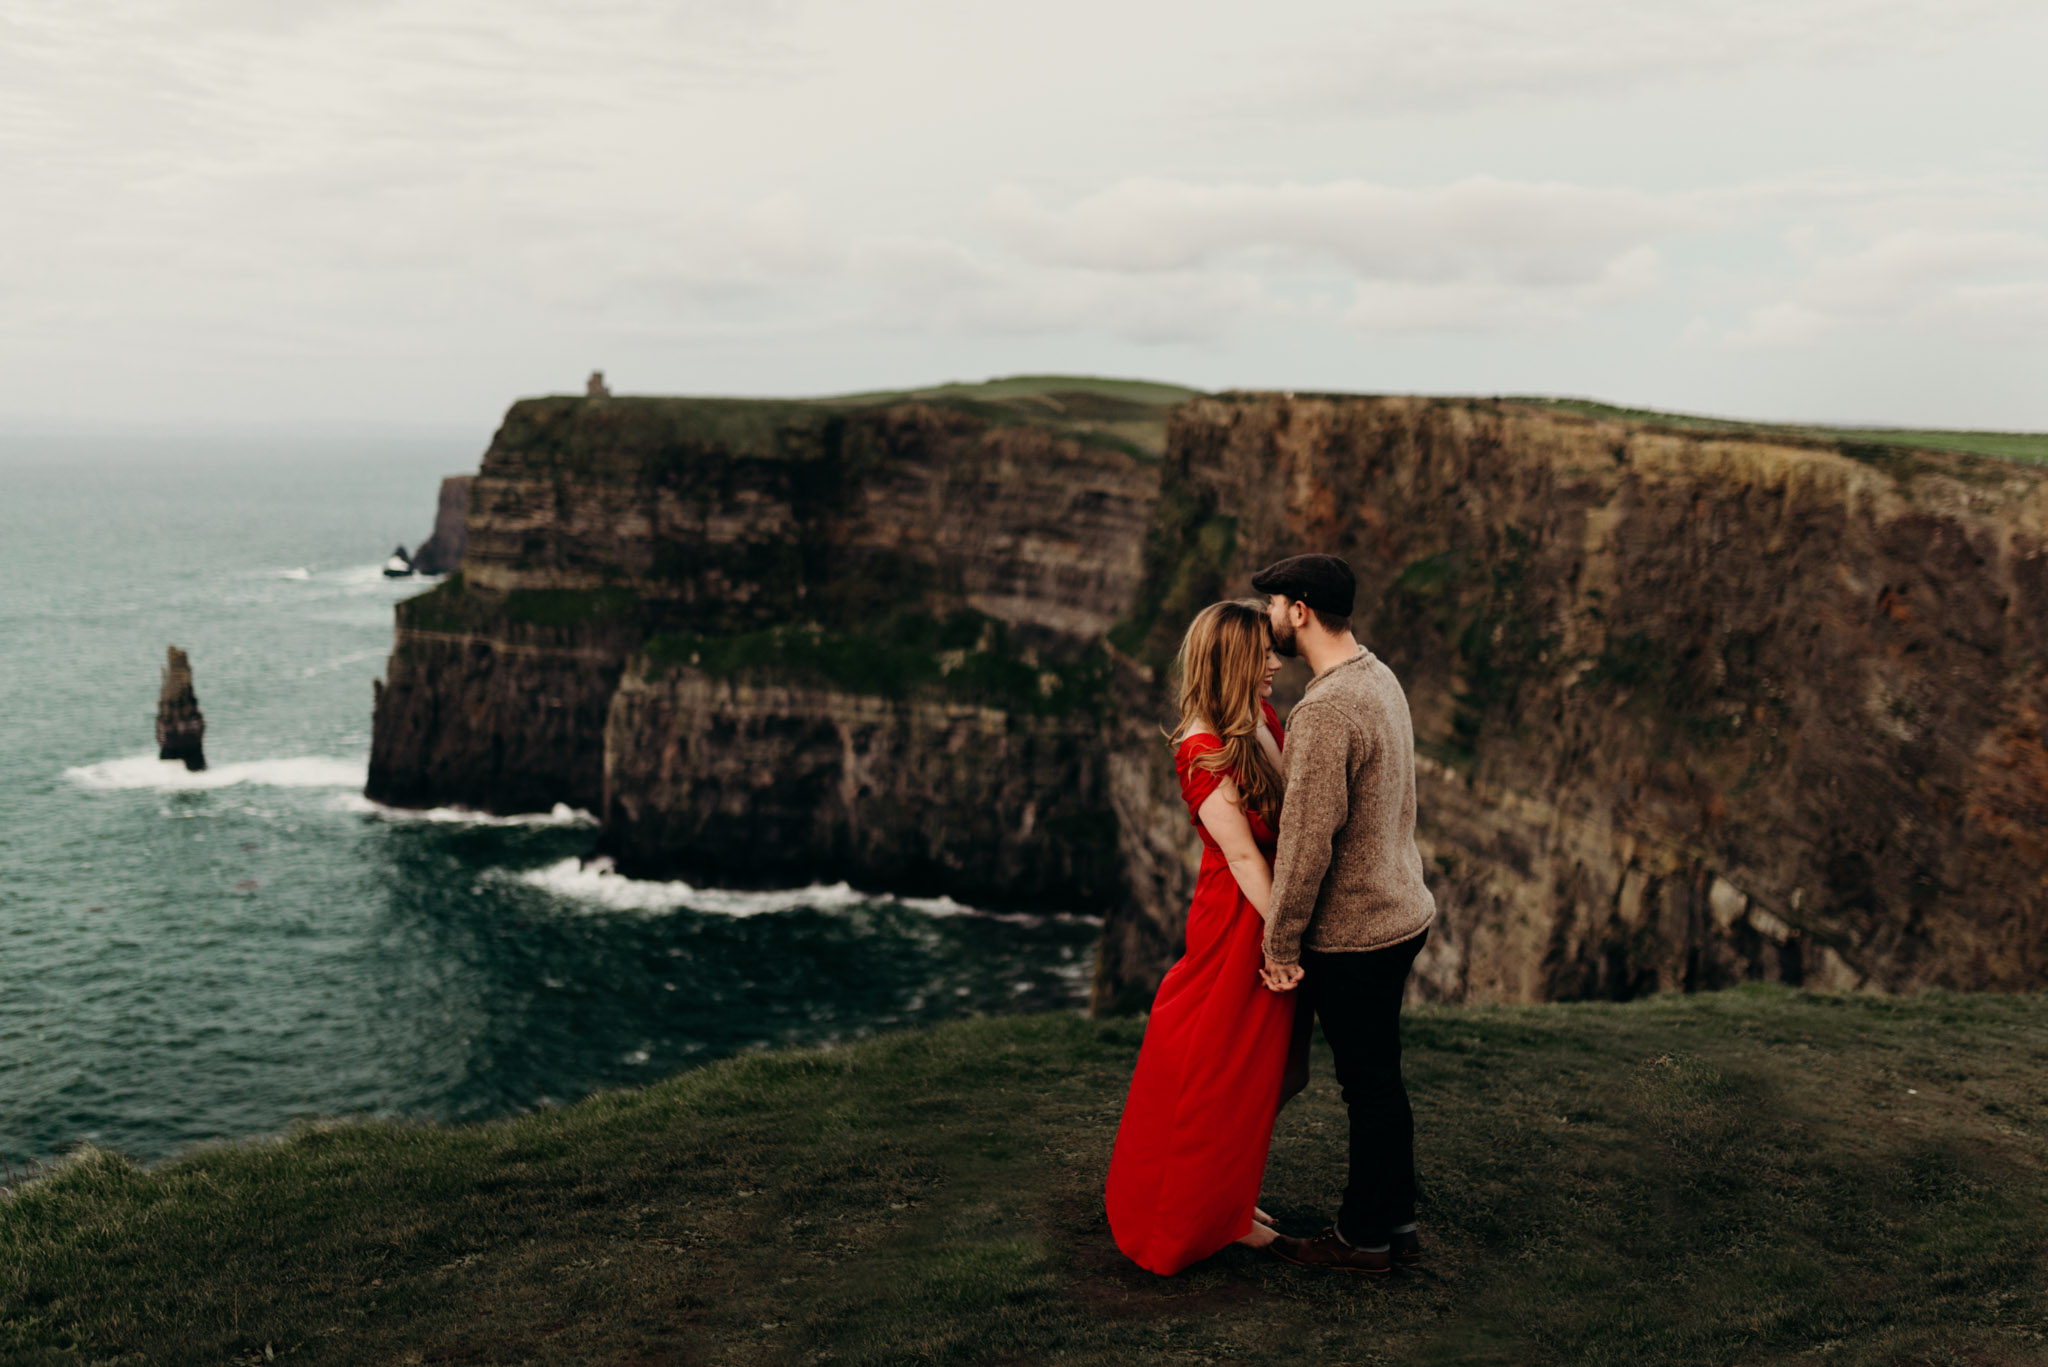 giants-causeway-bridal-portraits-northern-ireland-.jpg